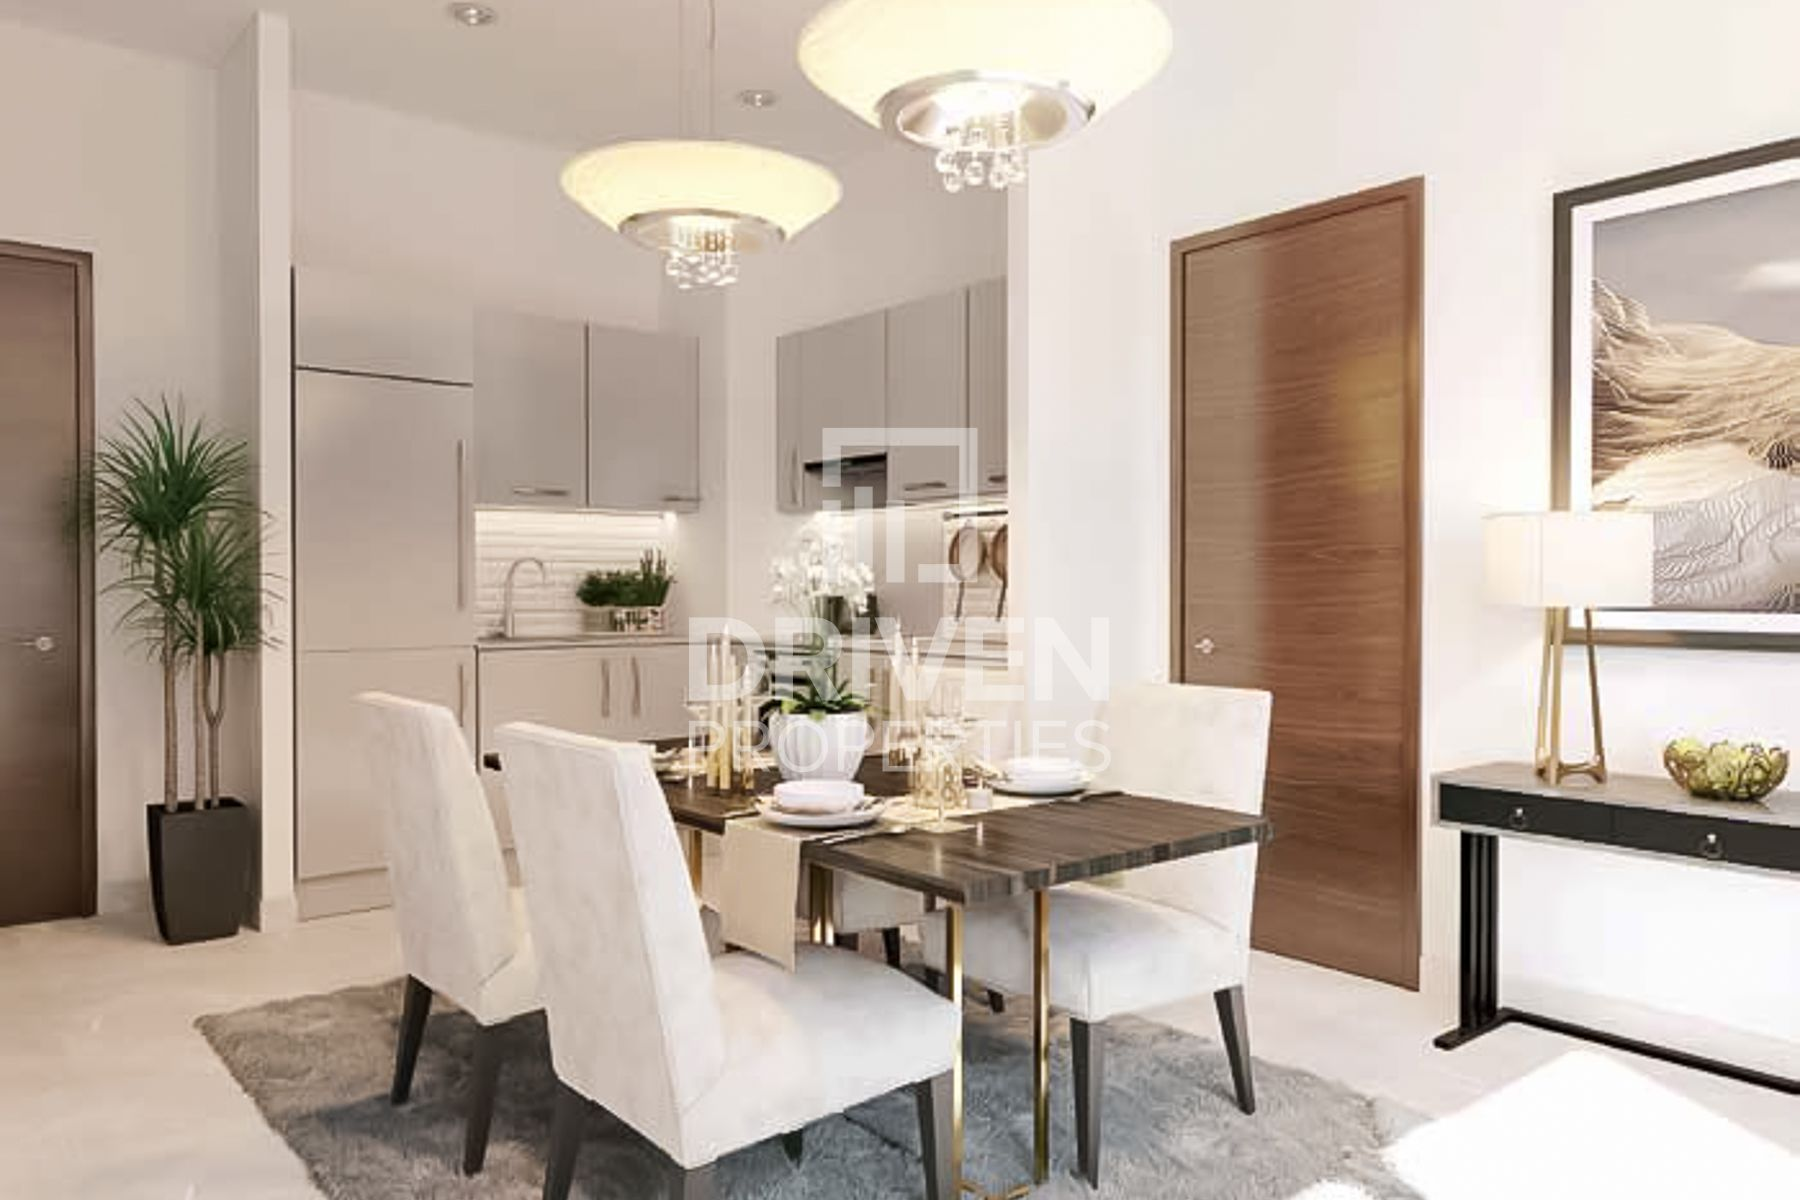 Apartment for Sale in Sobha Creek Vistas - Mohammed Bin Rashid City